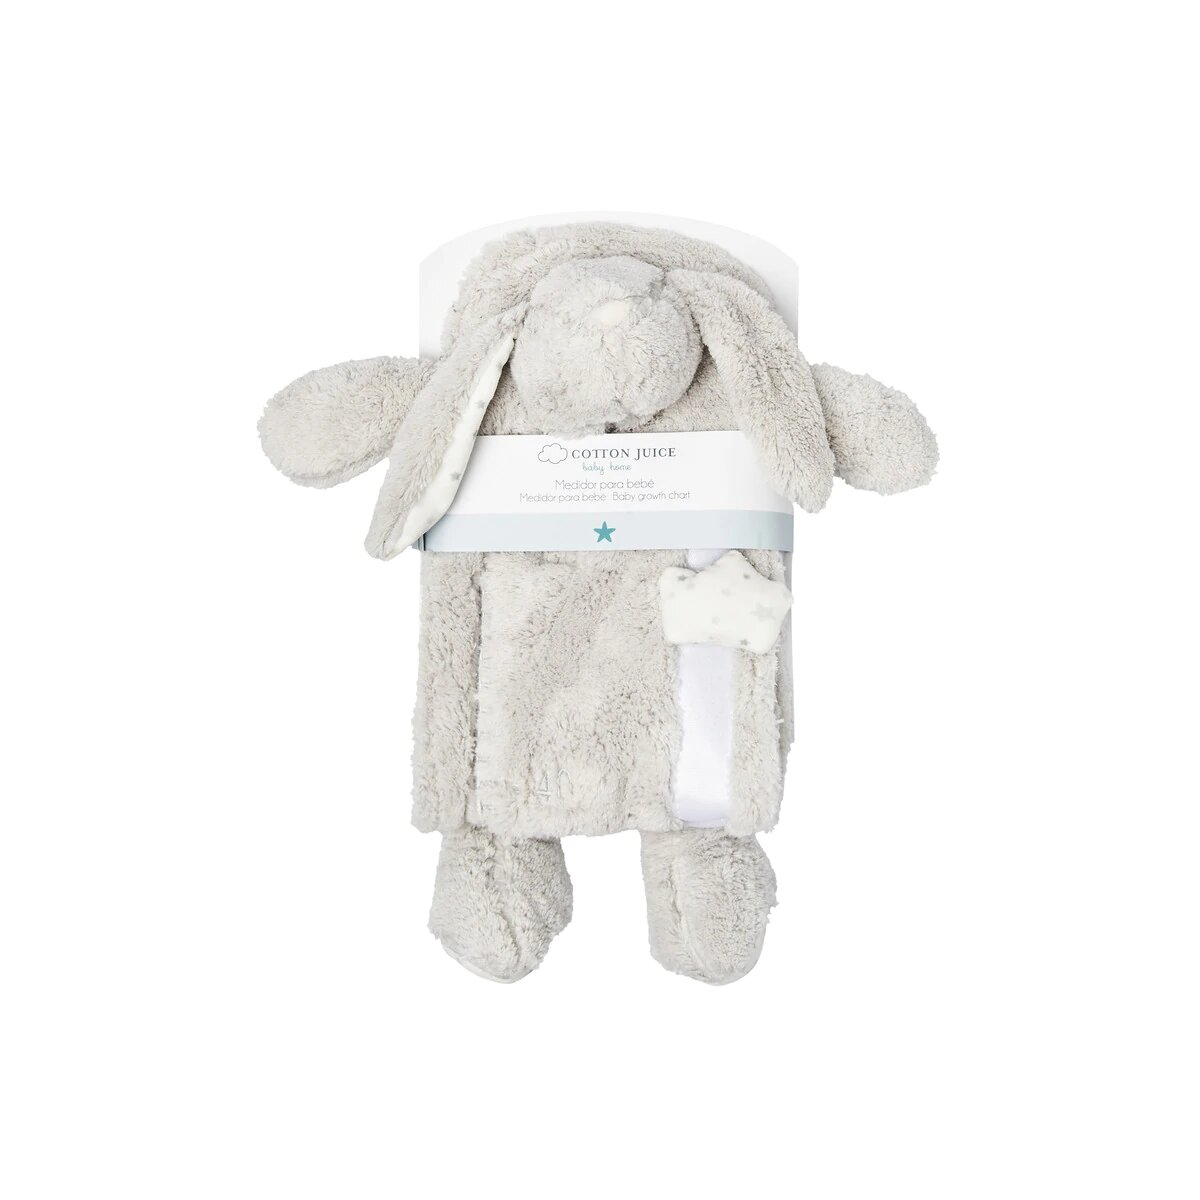 Medidor Infantil Cotton Juice Baby Home Conejito gris